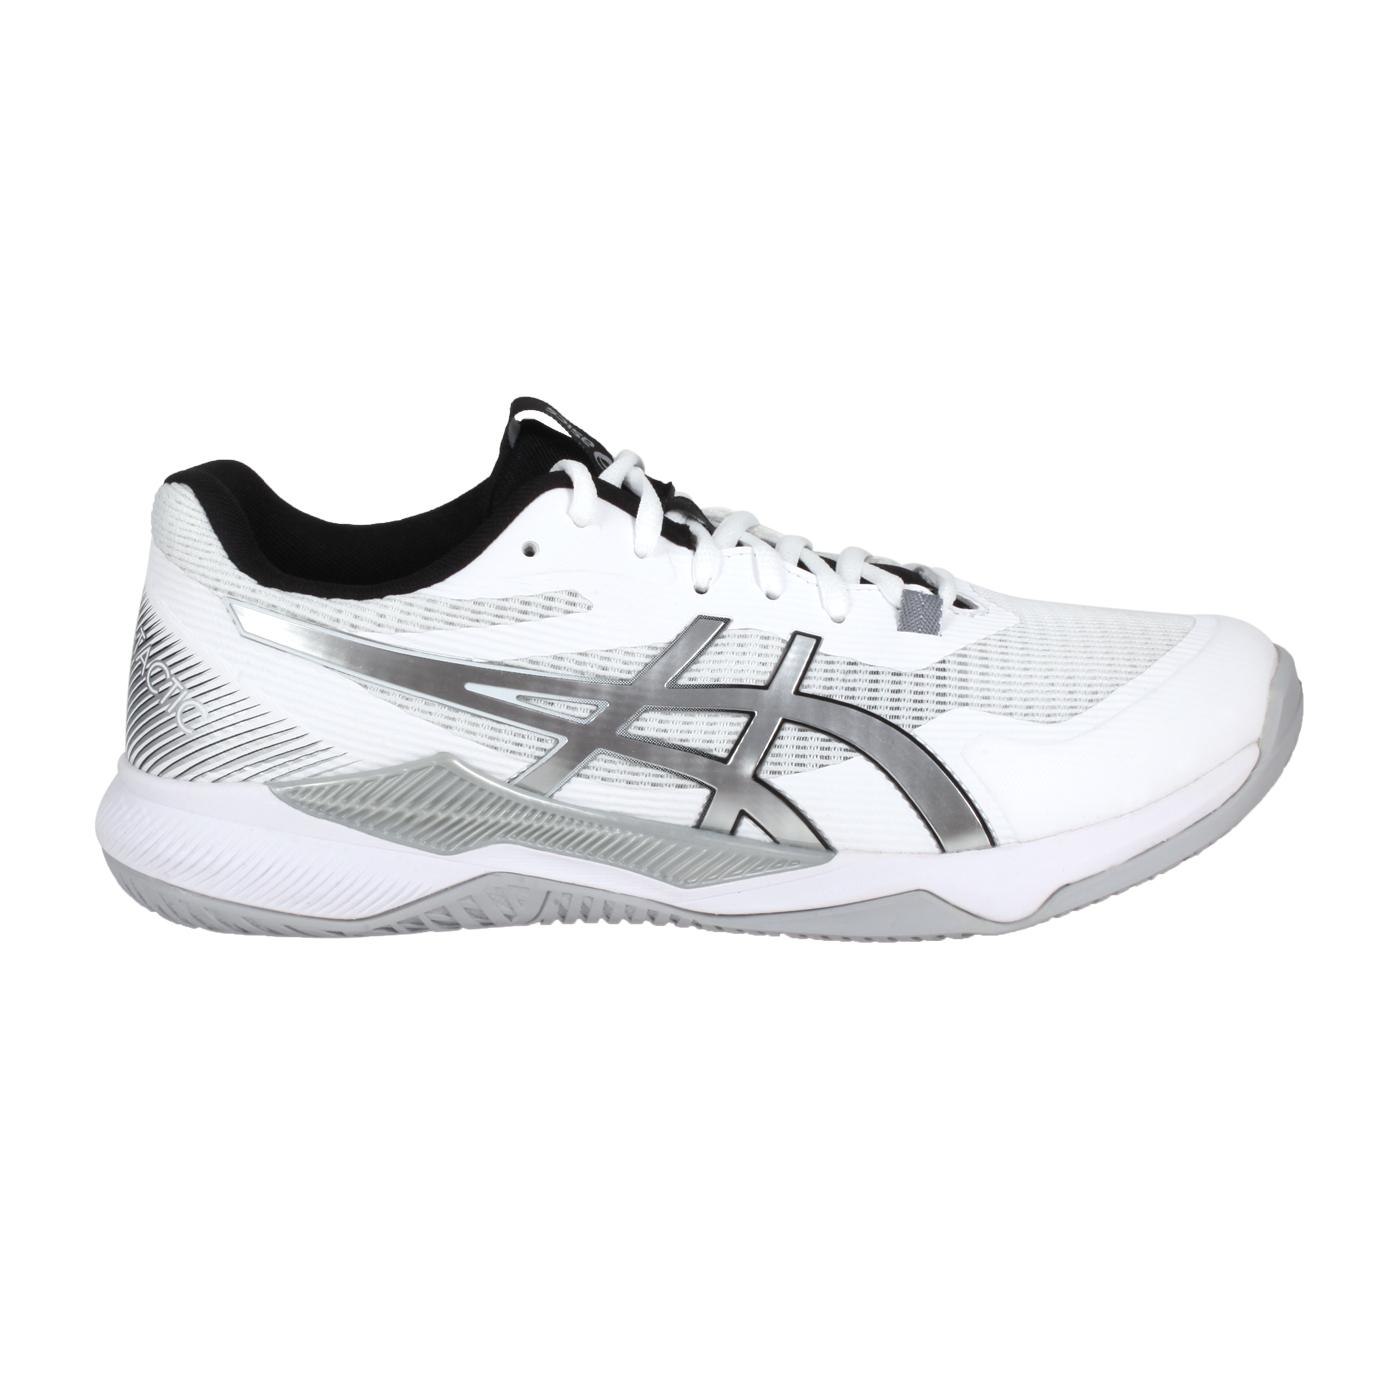 ASICS 男女排羽球鞋-2E  @GEL-TACTIC@1073A050-100